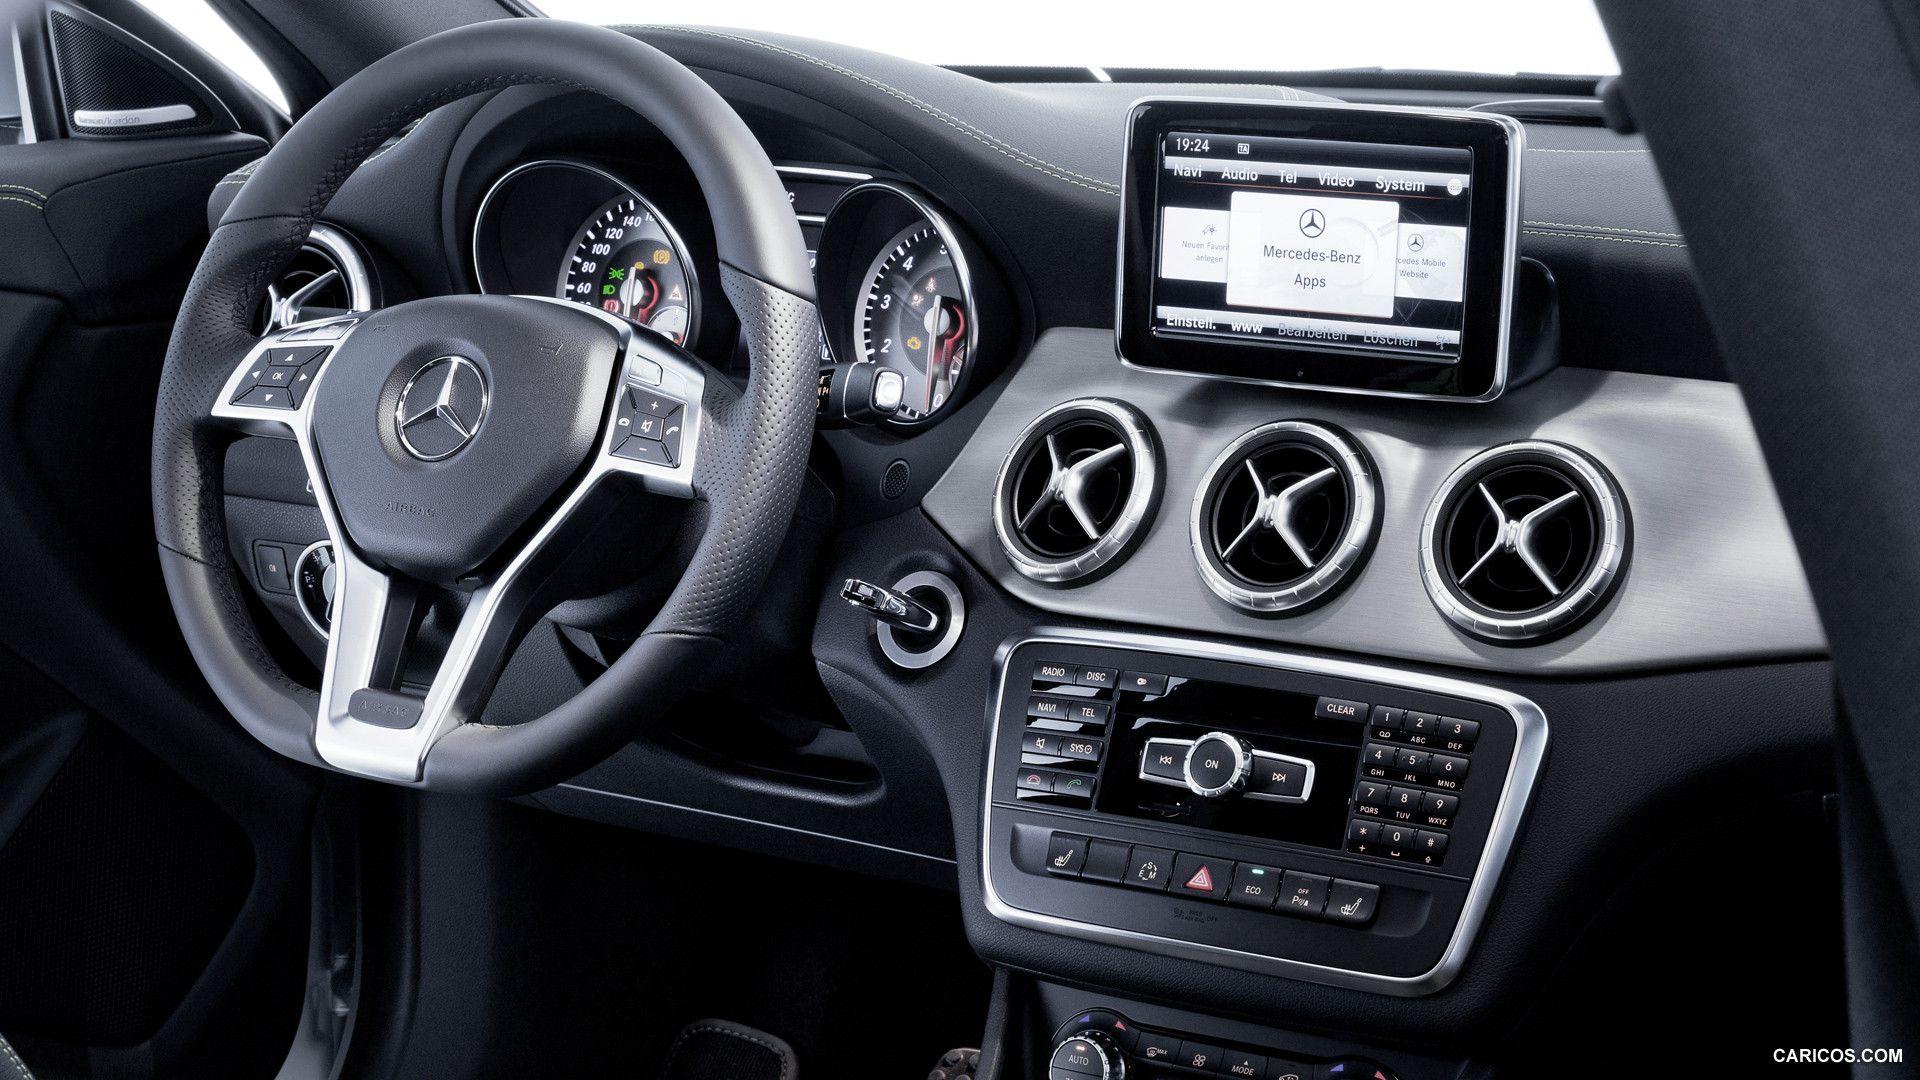 2014 Mercedes Benz Cla Class Mercedes Benz Cla 250 Benz Mercedes